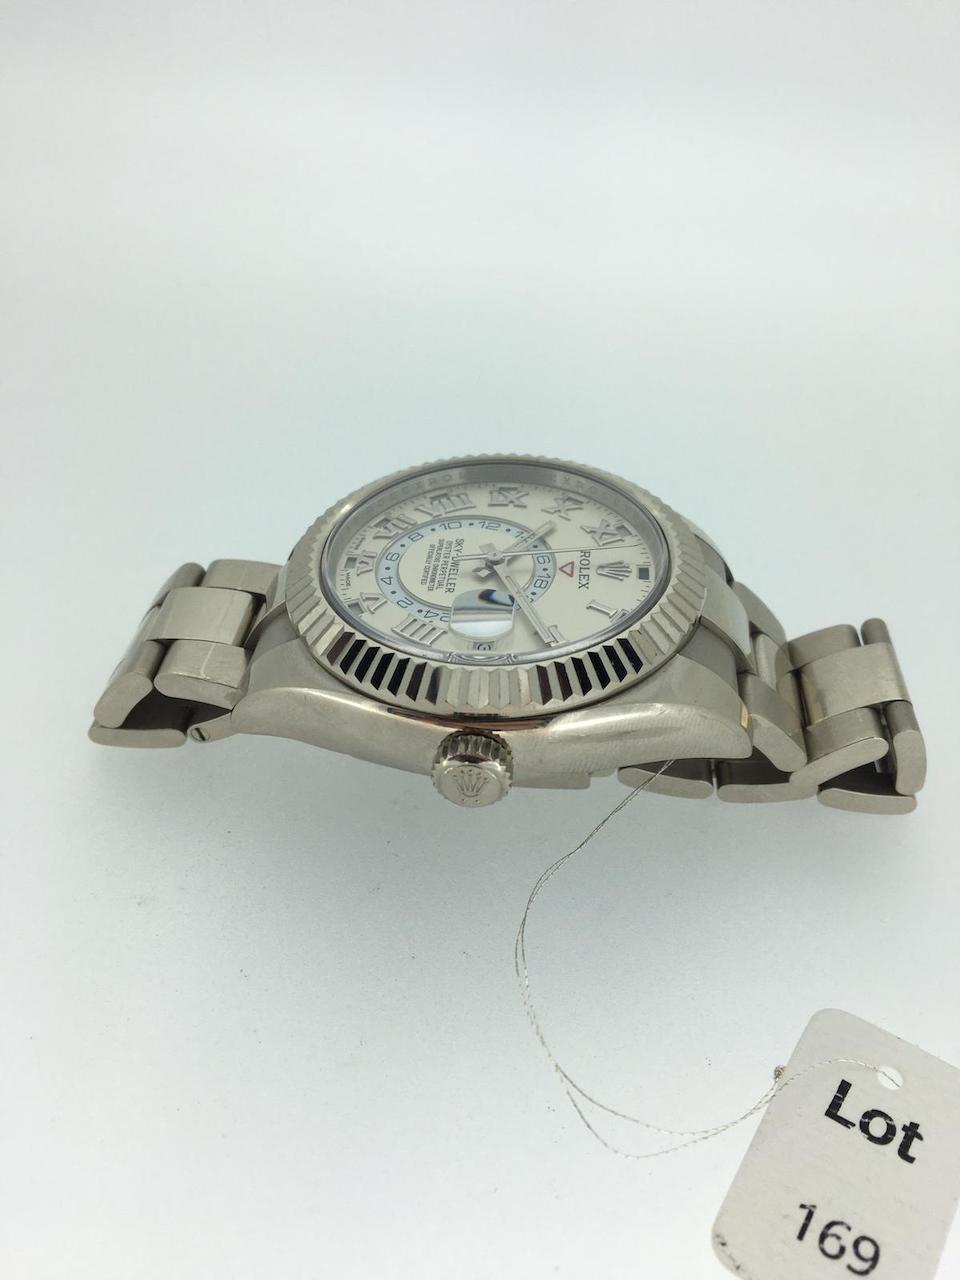 Rolex. An 18K white gold automatic calendar bracelet watch with dual time  Sky-Dweller, Ref: 326939, Circa 2017